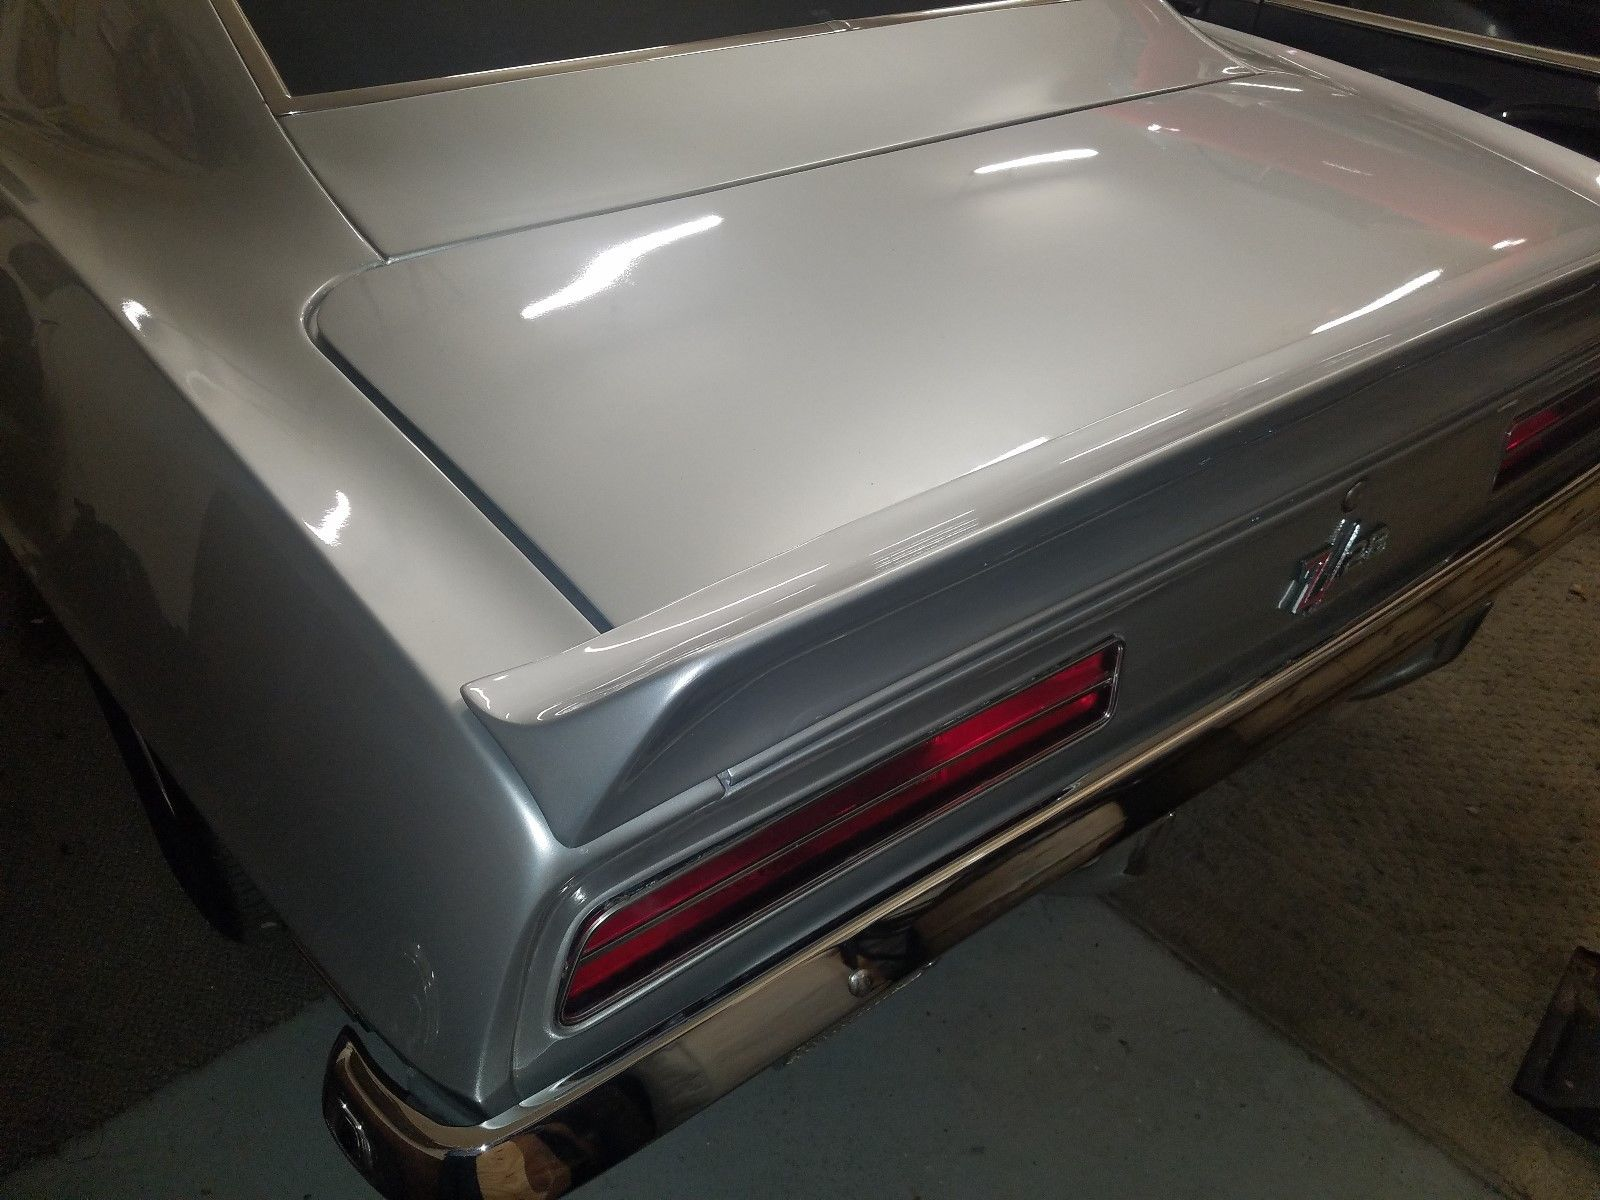 Amazing 1969 Chevrolet Camaro 4 Speed 1969 Camaro Z28 Or Trade Corvette  1963 1964 1965 1966 1967 1968 1970 1971 1972 2017 2018